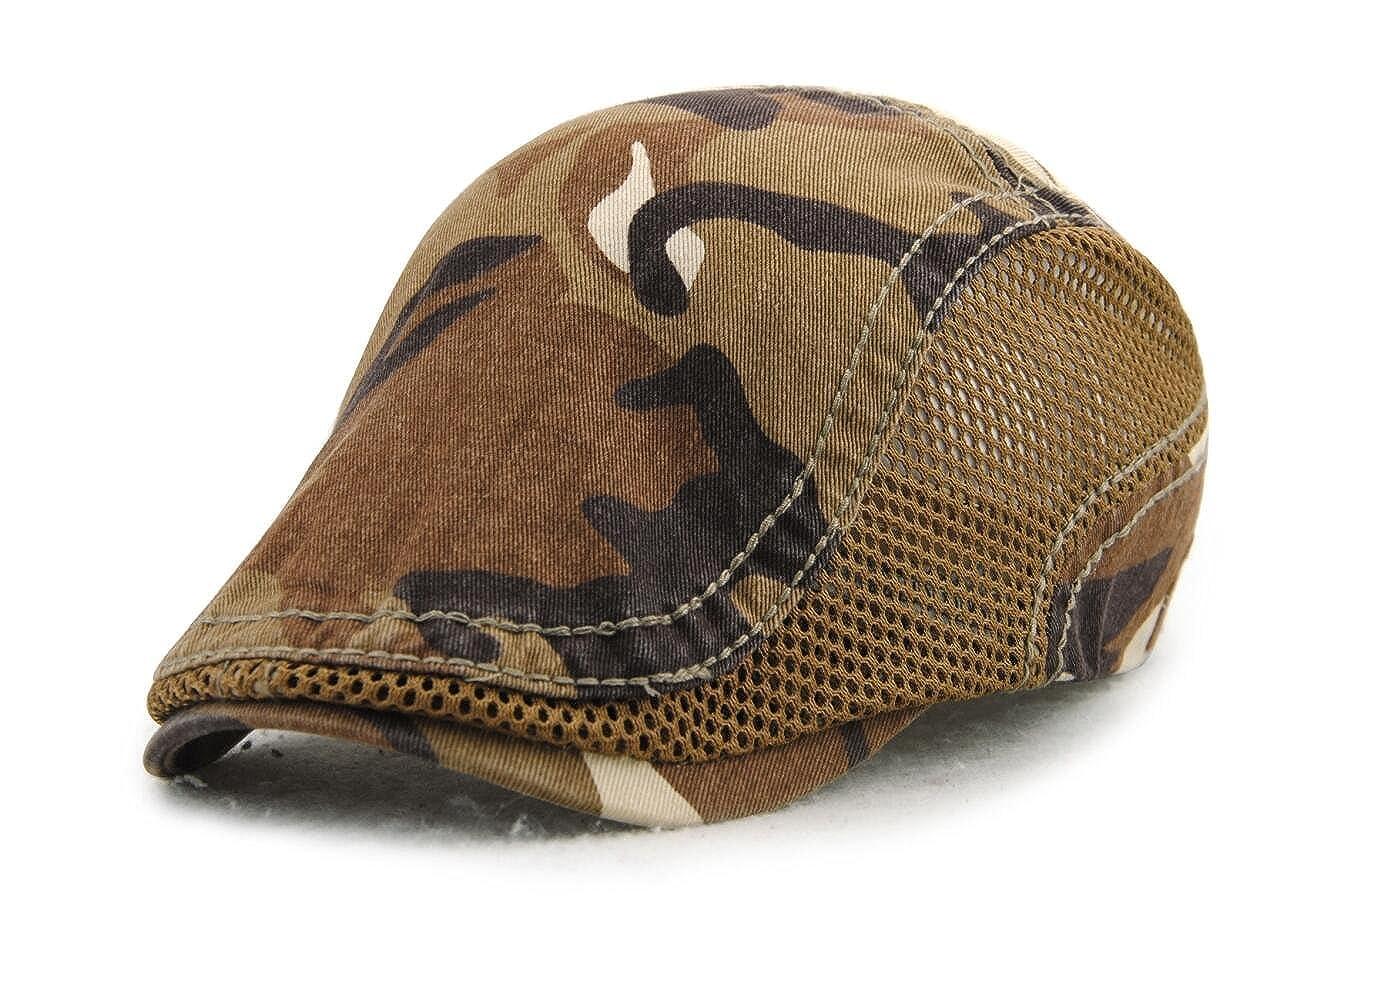 723aaf17 Amazon.com: Elwow Men's Outdoor Sports Camouflage Vintage Newsboy Cap,  Women's Flat Driver Cap, Irish Hat, Outdoor Sports Sun Hat with Adjustable  Strap: ...